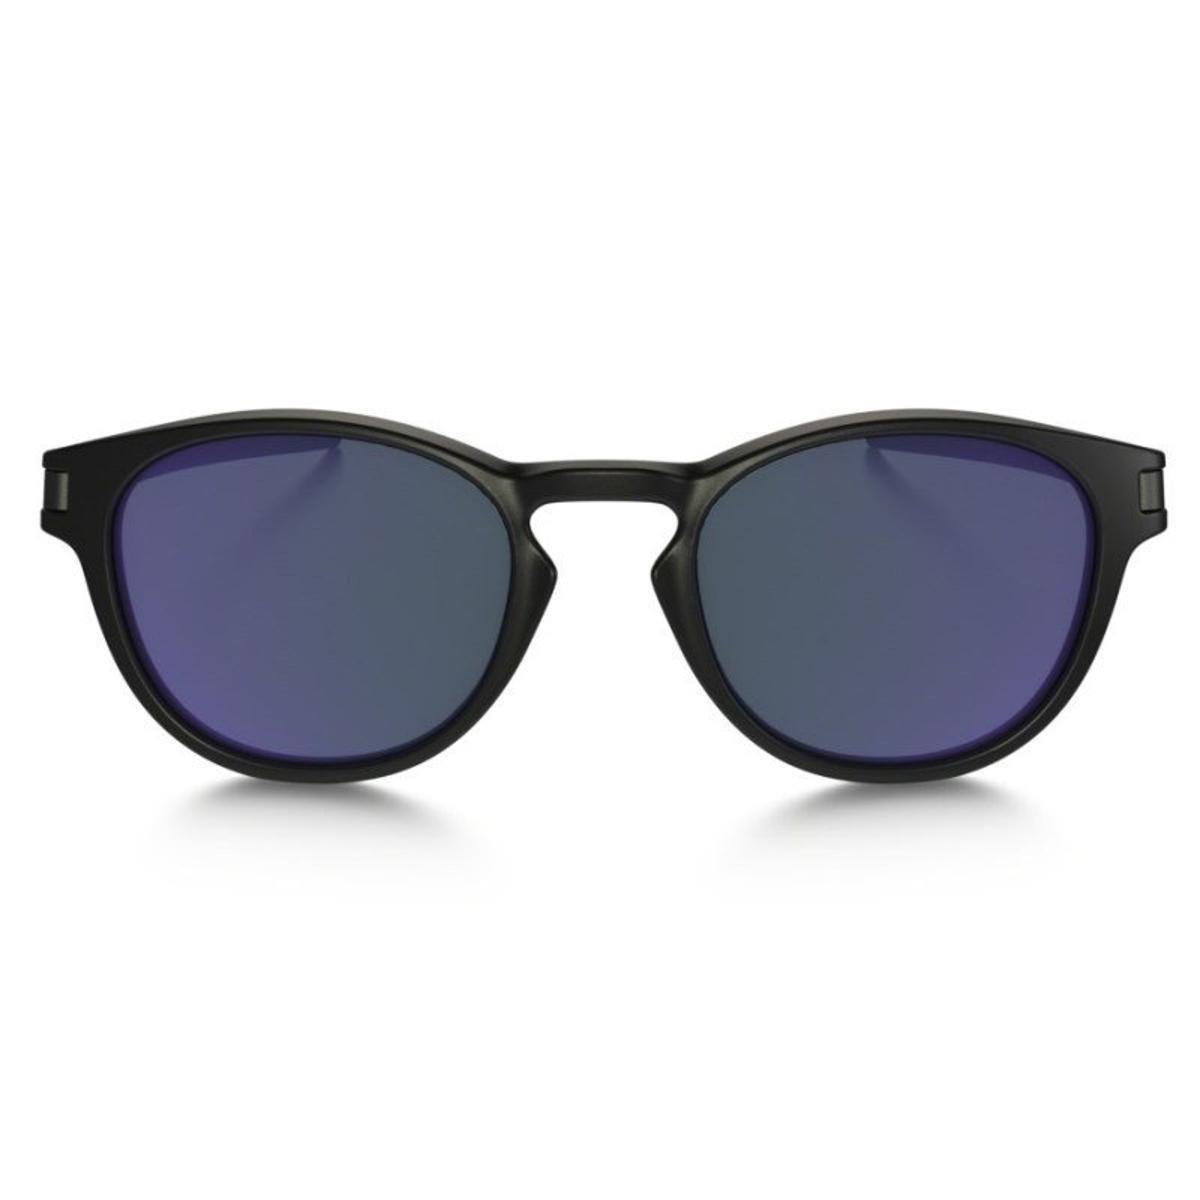 958f595dfbb24 Óculos Oakley Latch Matte Black   Violet Iridium - Preto e Lilás ...